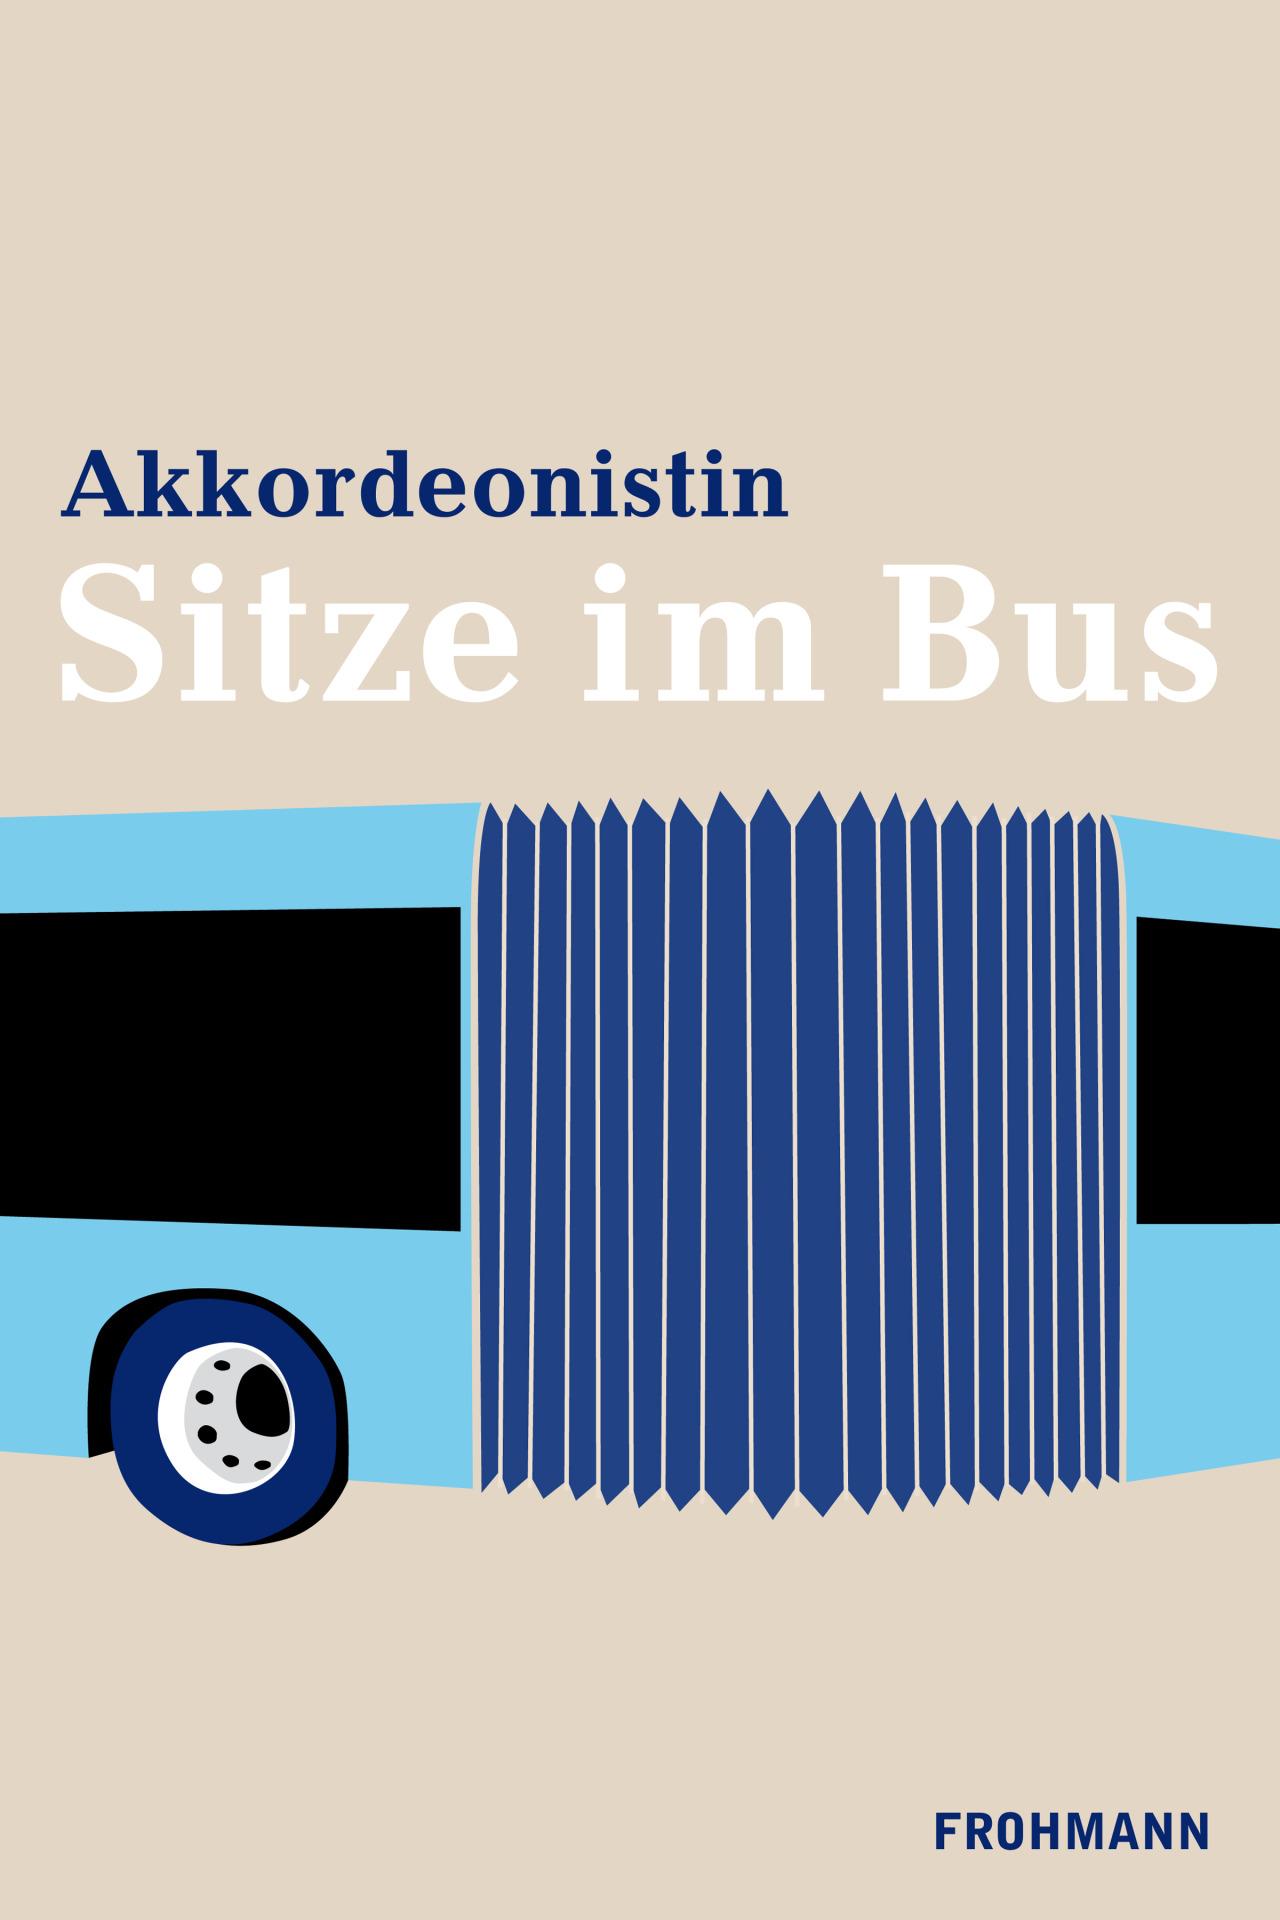 Akkordeonistin Sitze im Bus (ePub, mobi) EUR 2,99/CHF 3,50 ISBNePub: 978-3-944195-63-6 ISBNmobi: 978-3-944195-64-3 Shops ePub: Apple, Dussmann, Hugendubel, Mayersche, Minimore, Minimore, Ocelot, Osiander, Thalia, Schweitzer, Weltbild. Kindle-Mobi:...